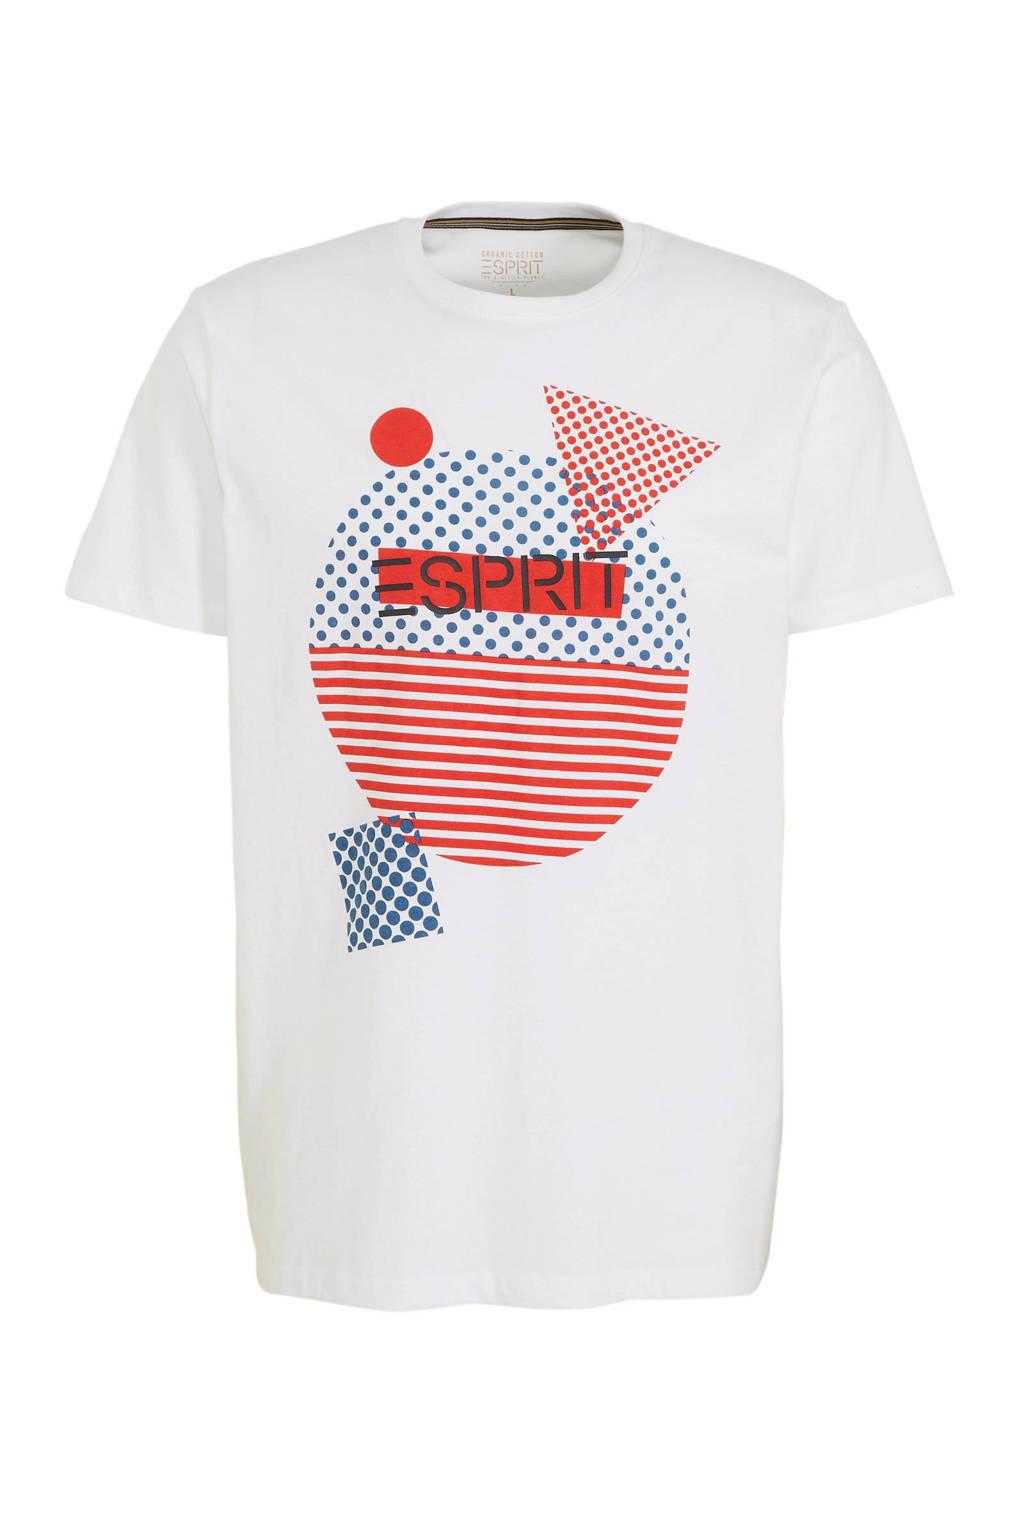 ESPRIT Men Casual T-shirt met printopdruk wit, Wit